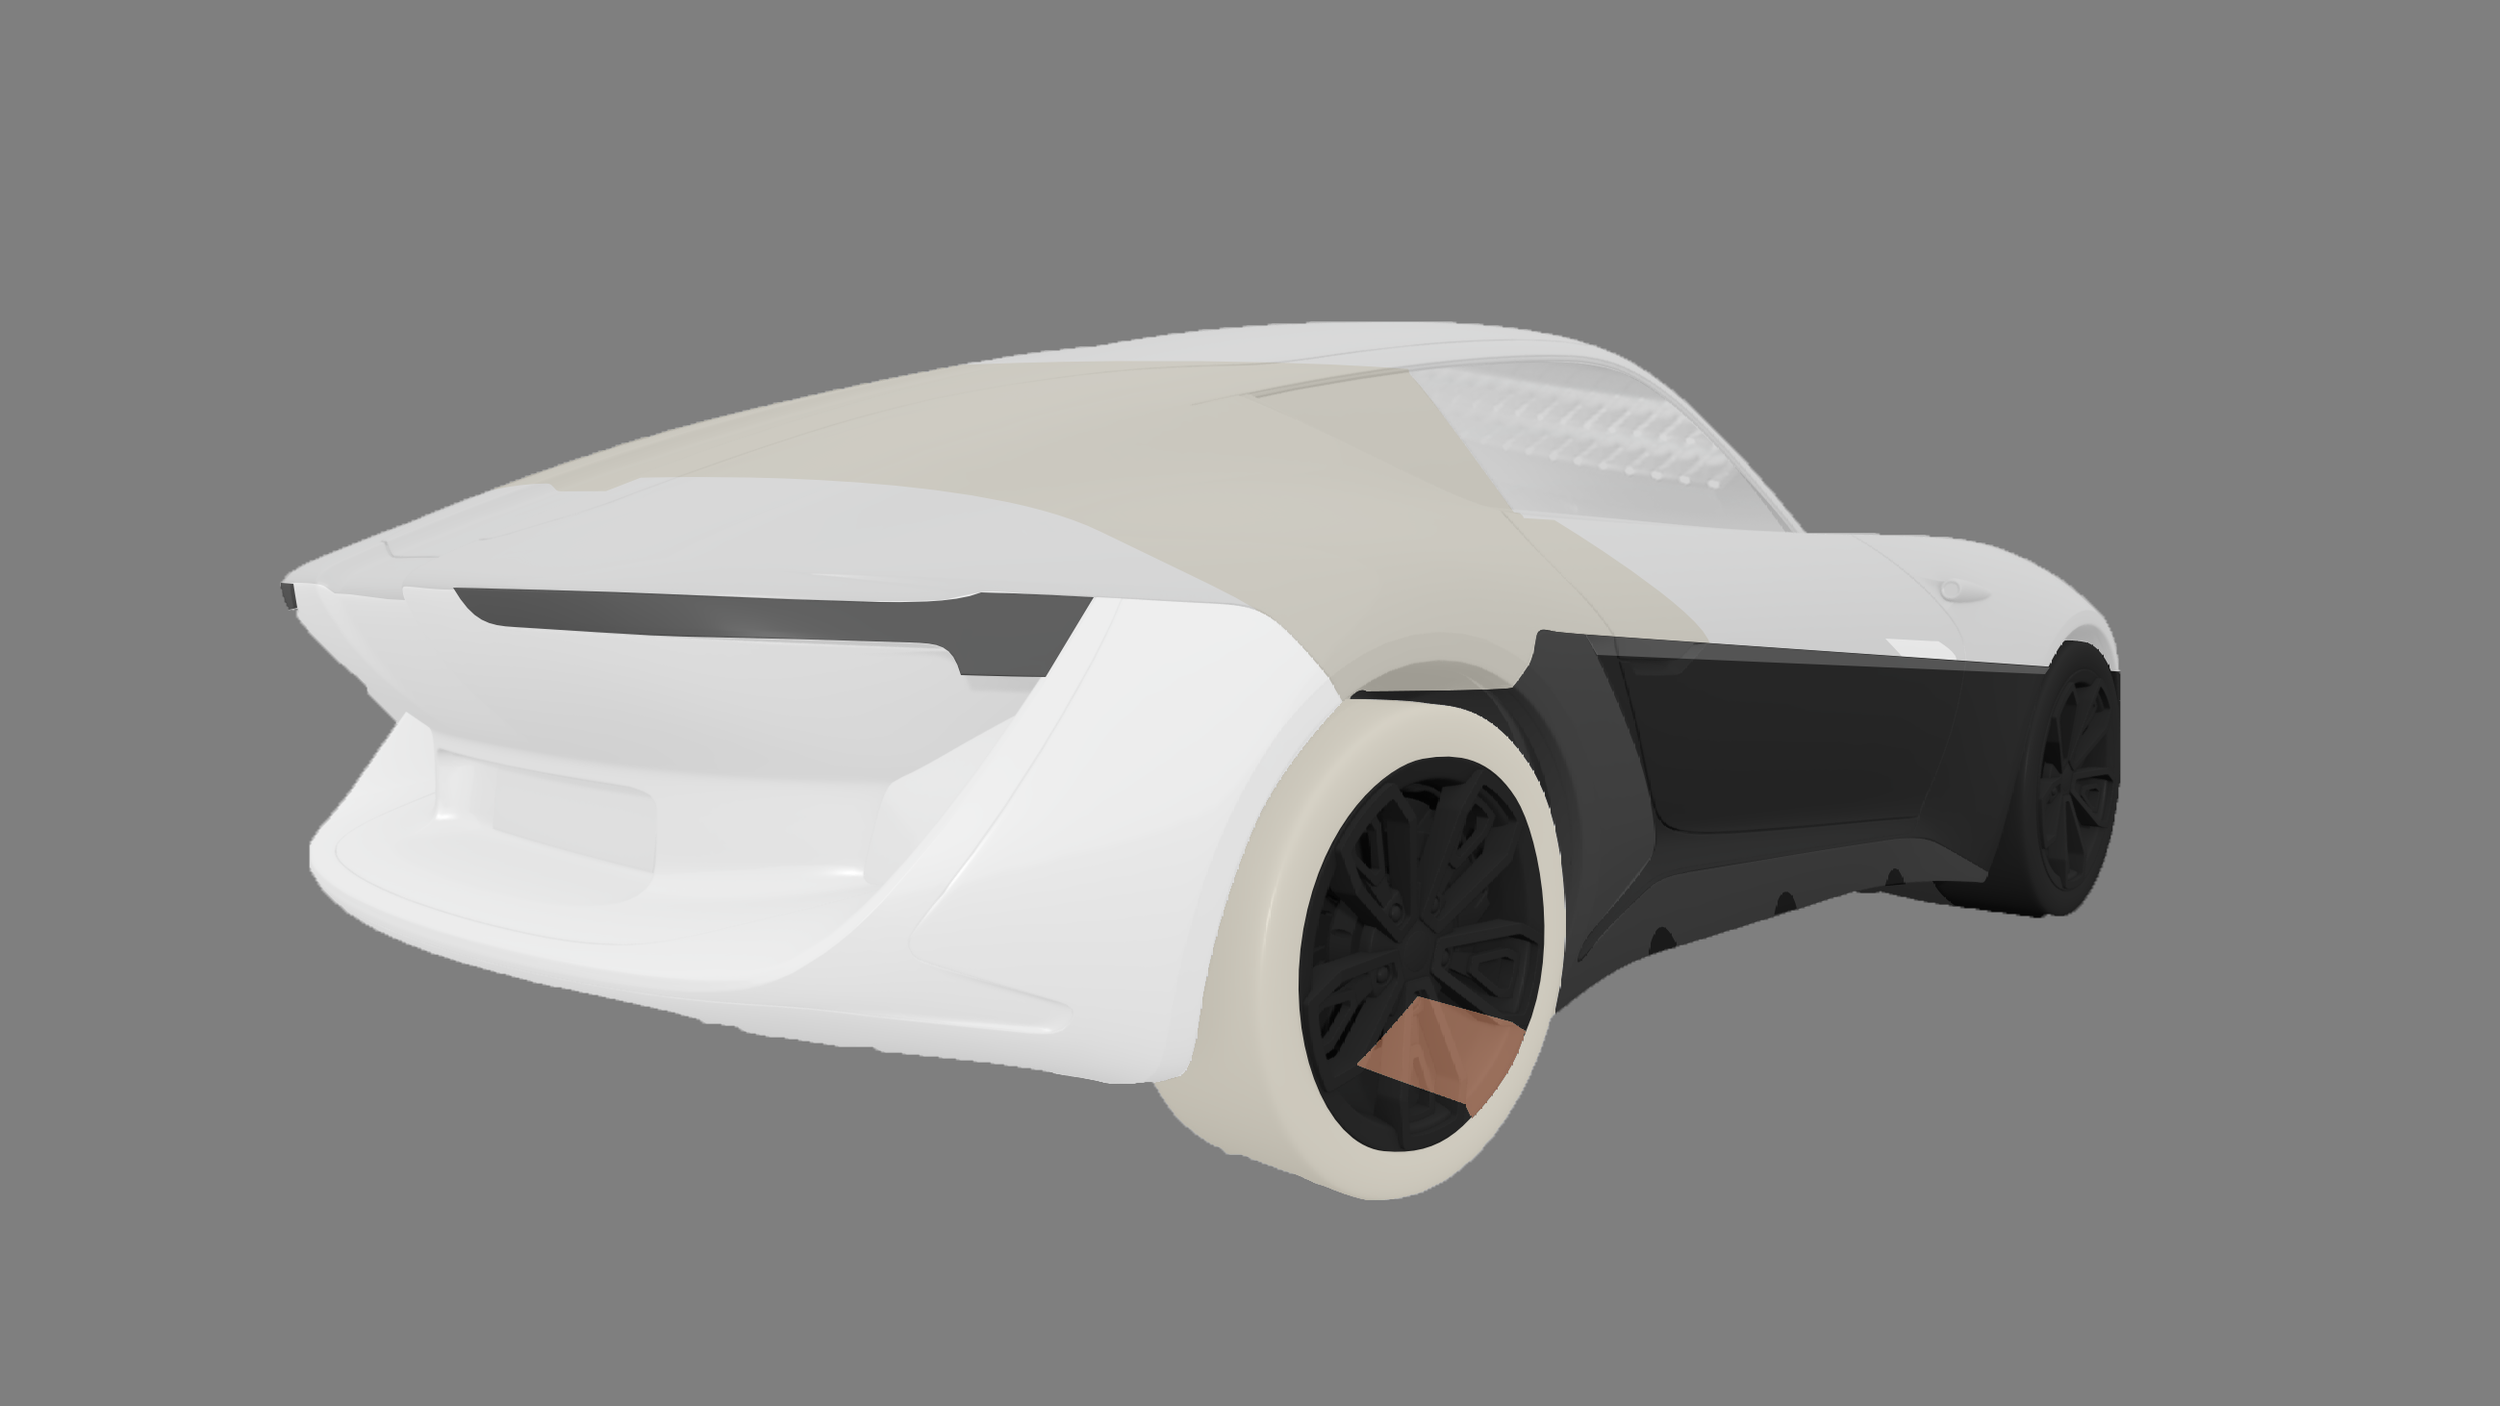 thomas charier xtaon contest concept car sketch design back